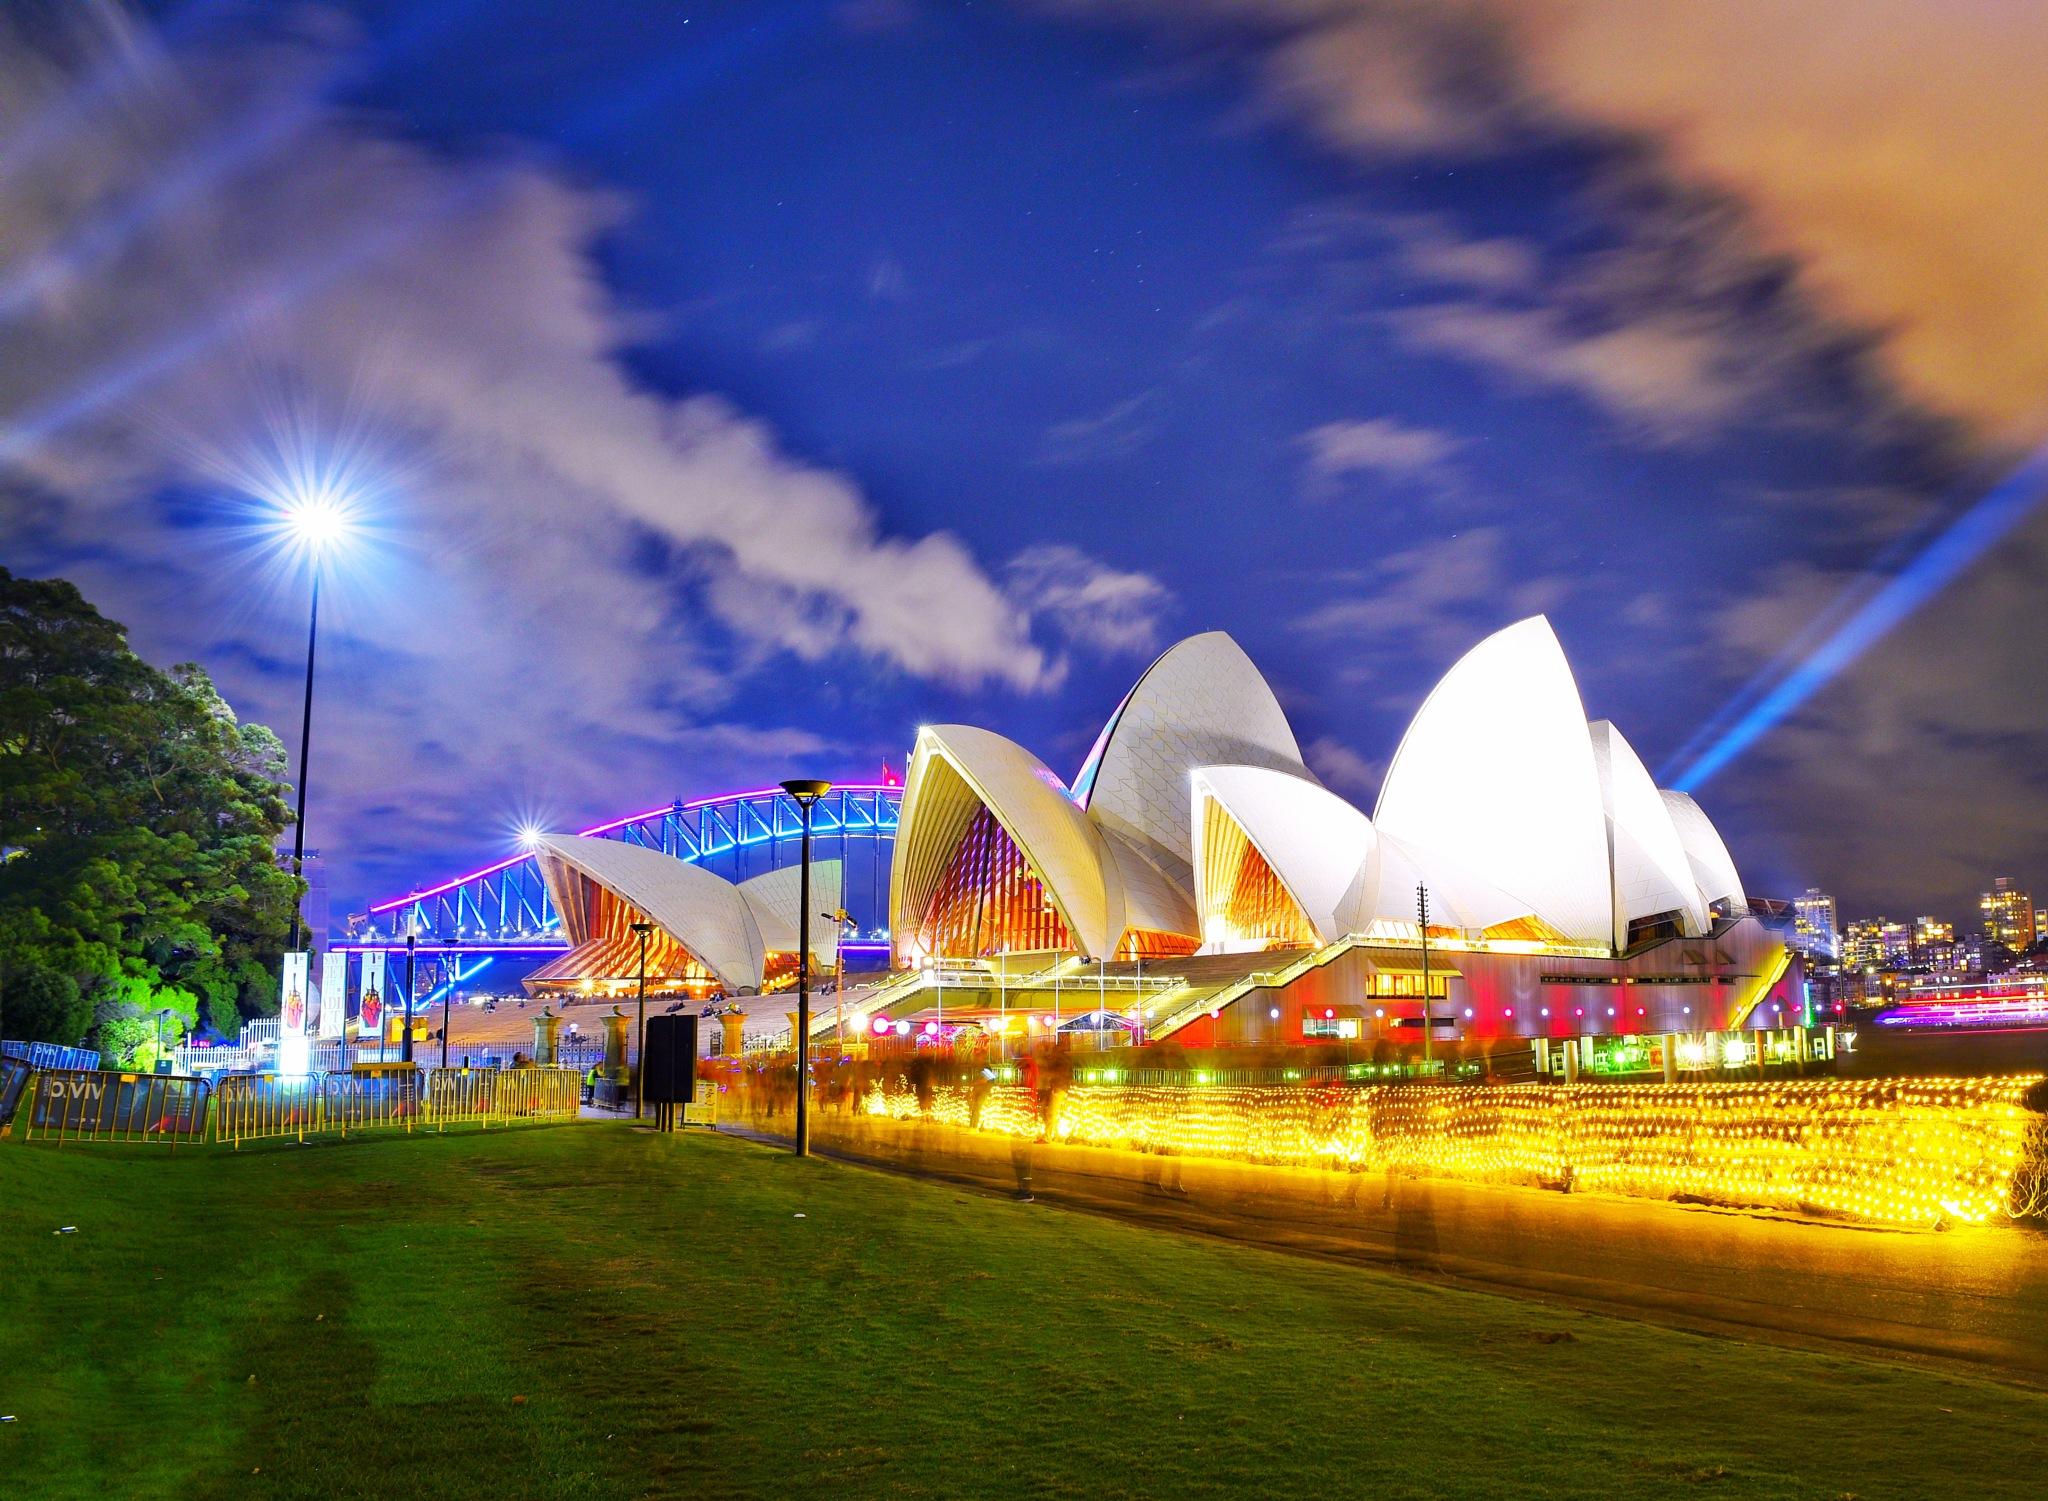 Vivid Sydney 2017 by Theresa Duong